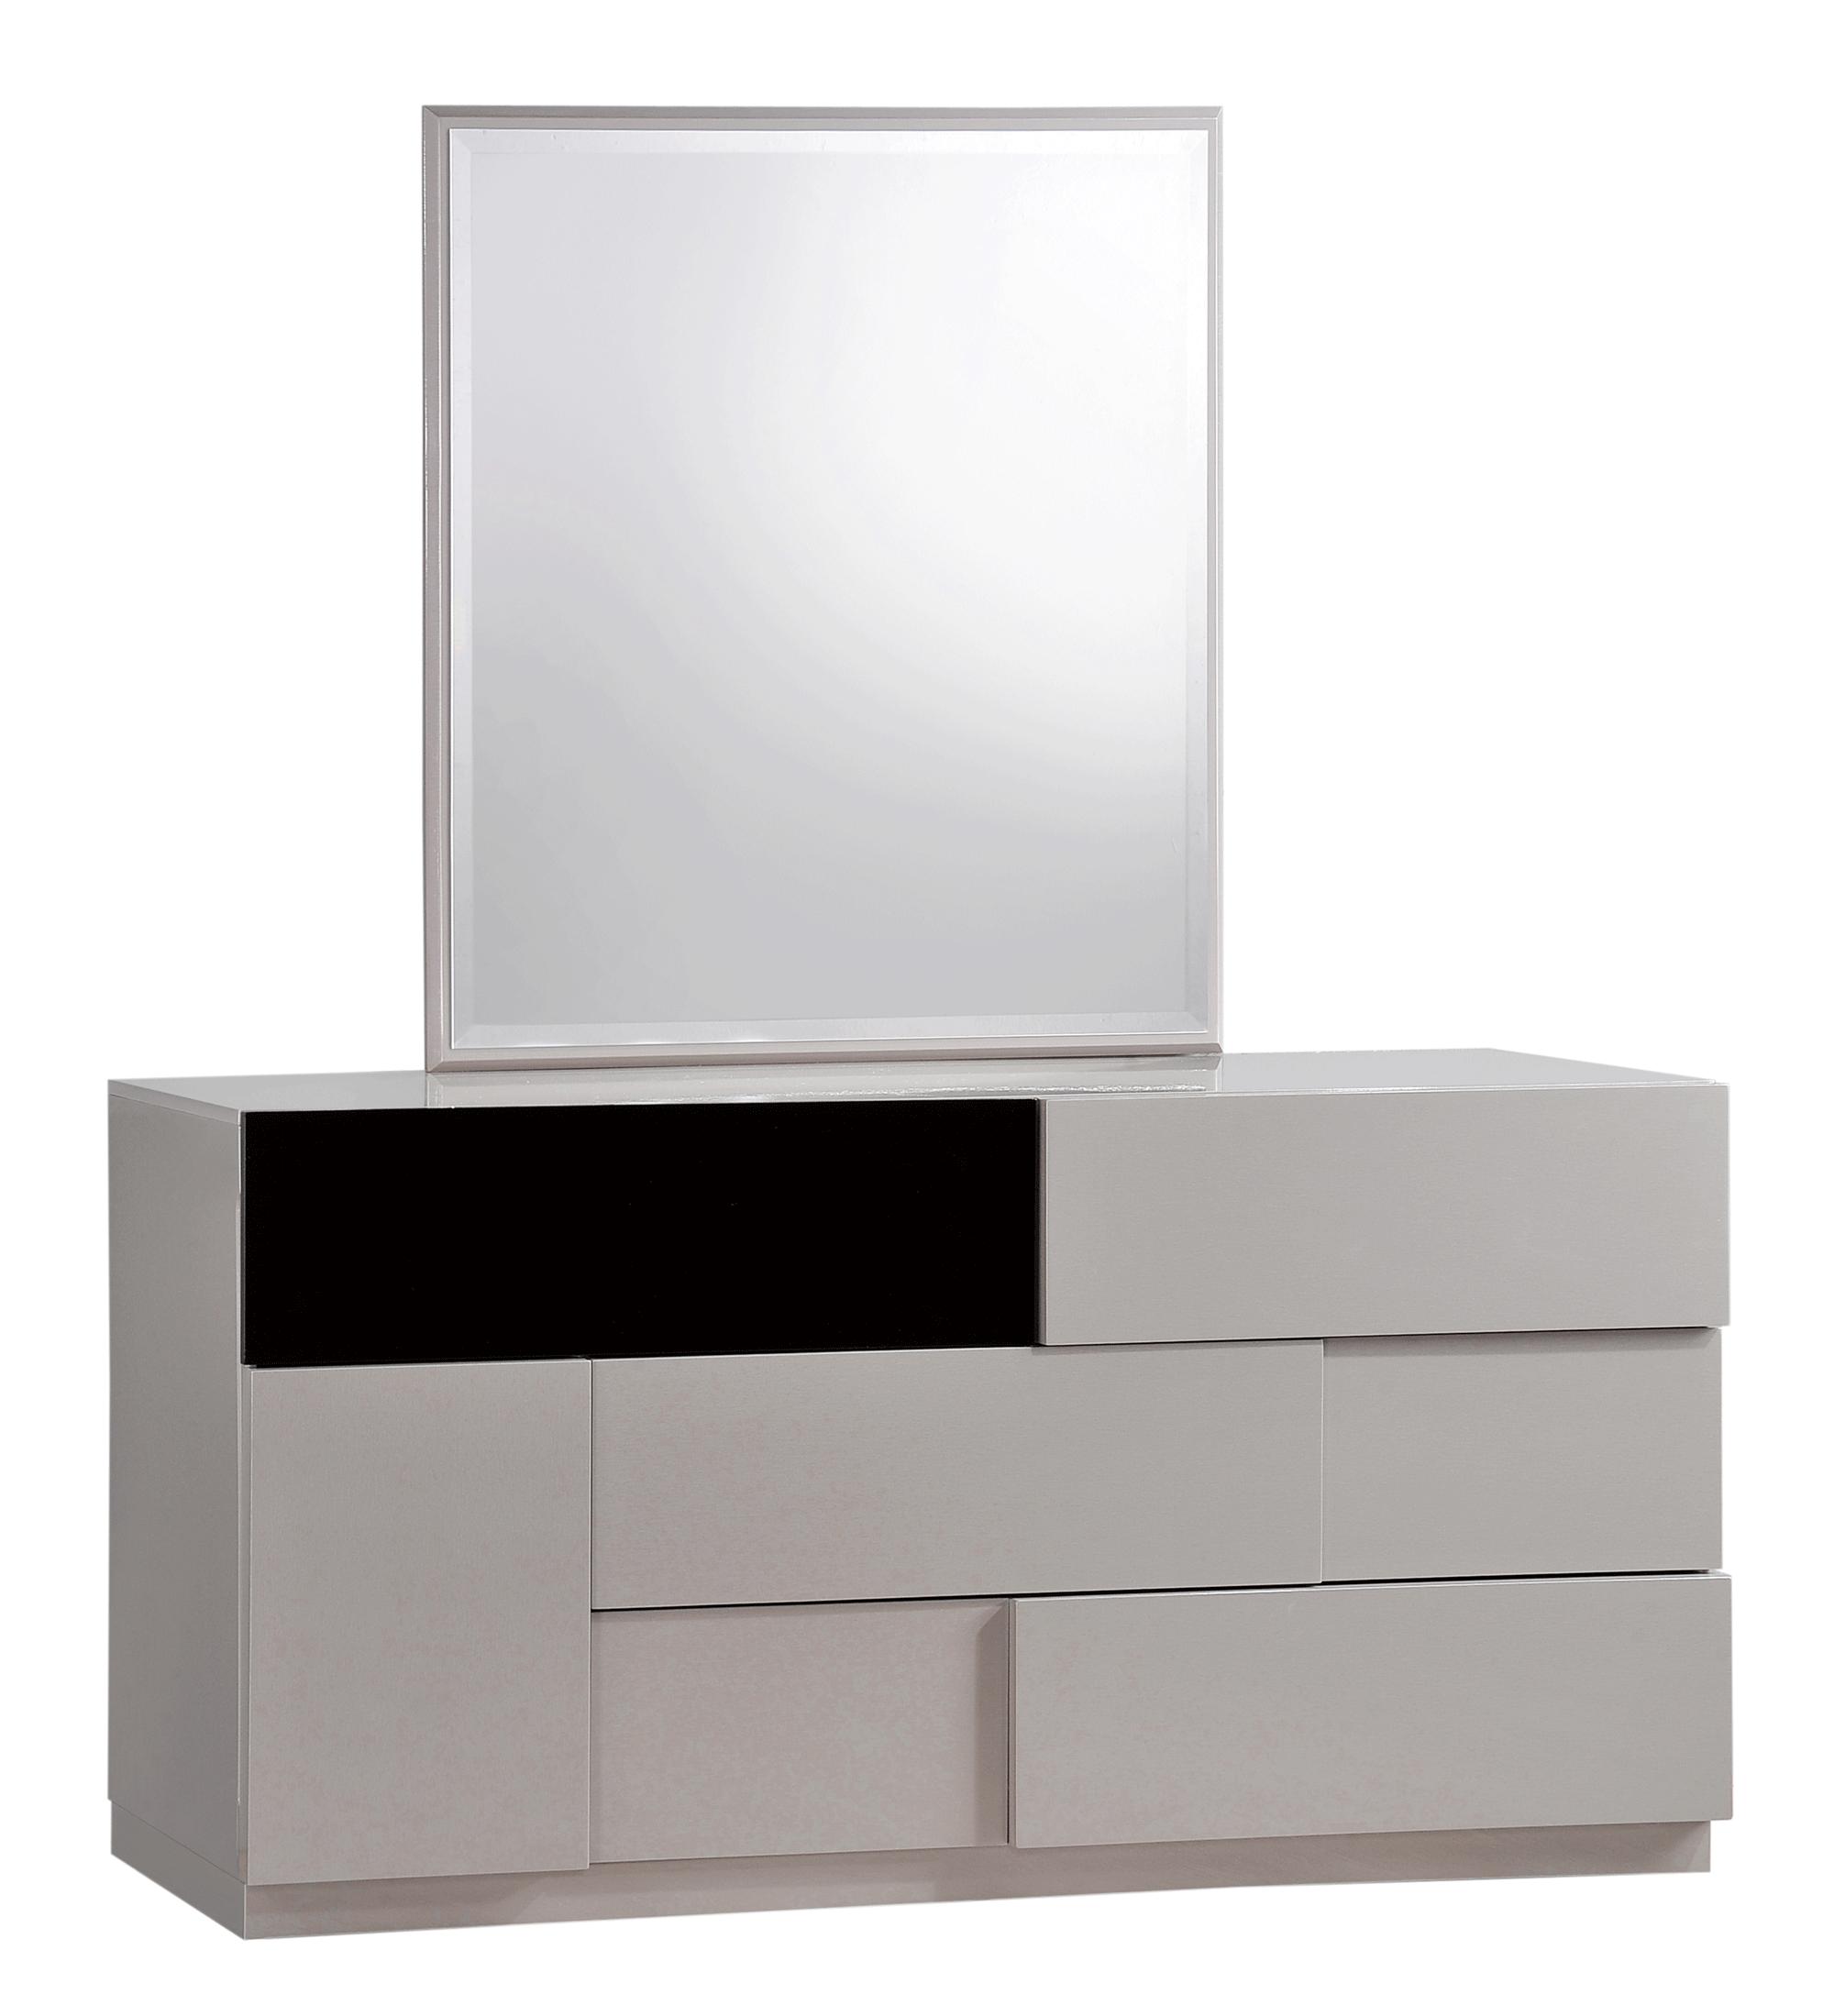 . Bianca Grey Glossy   Black Glossy Dresser by Global Furniture